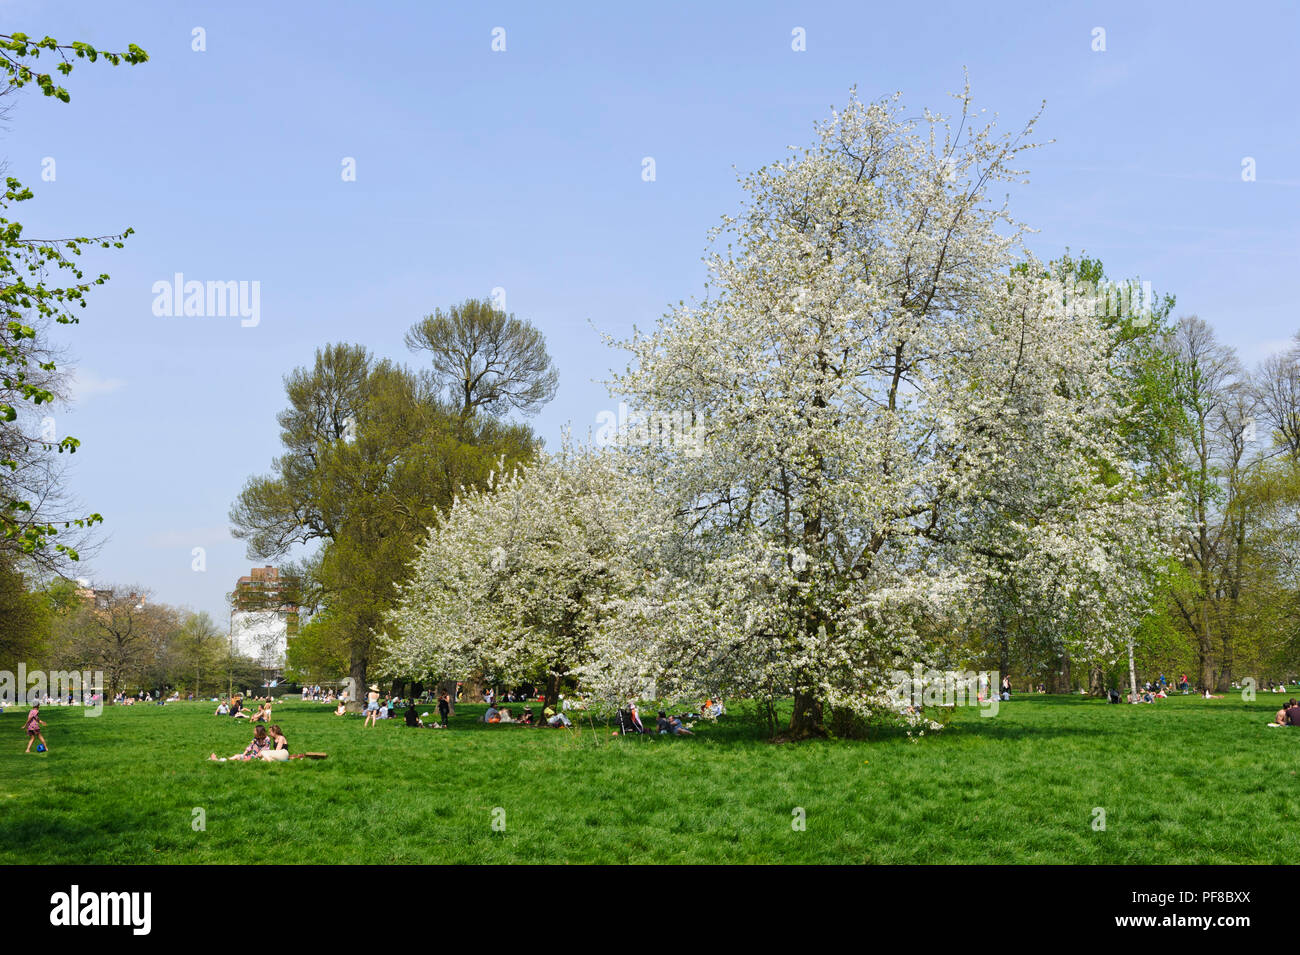 People enjoying the hot weather in Hyde Park, London, England, UK - Stock Image